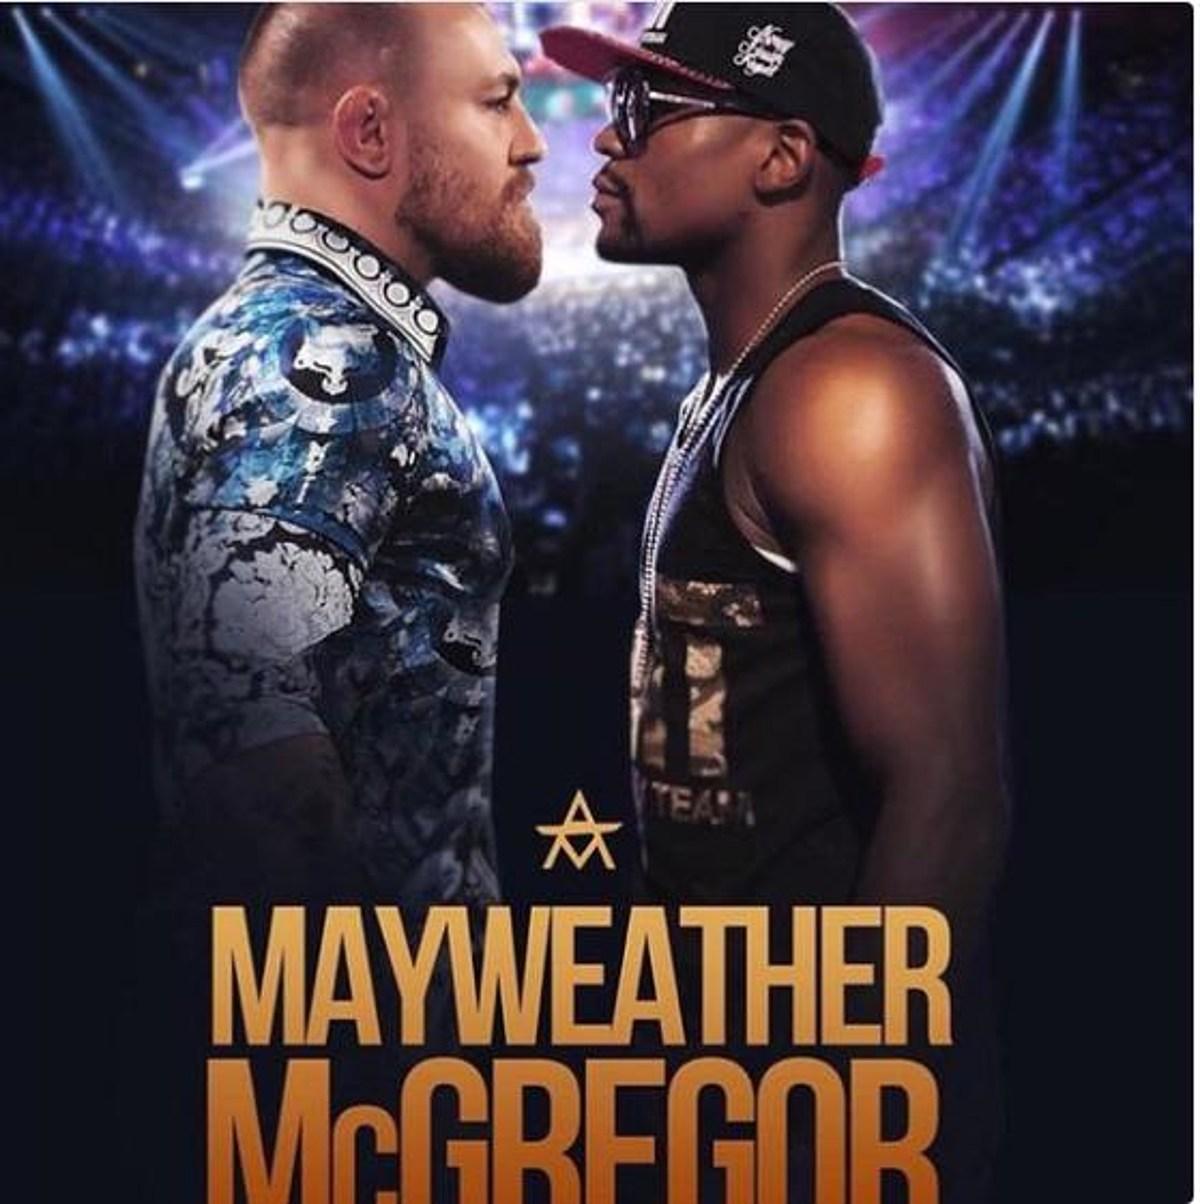 Mayweather Mcgregor Bet